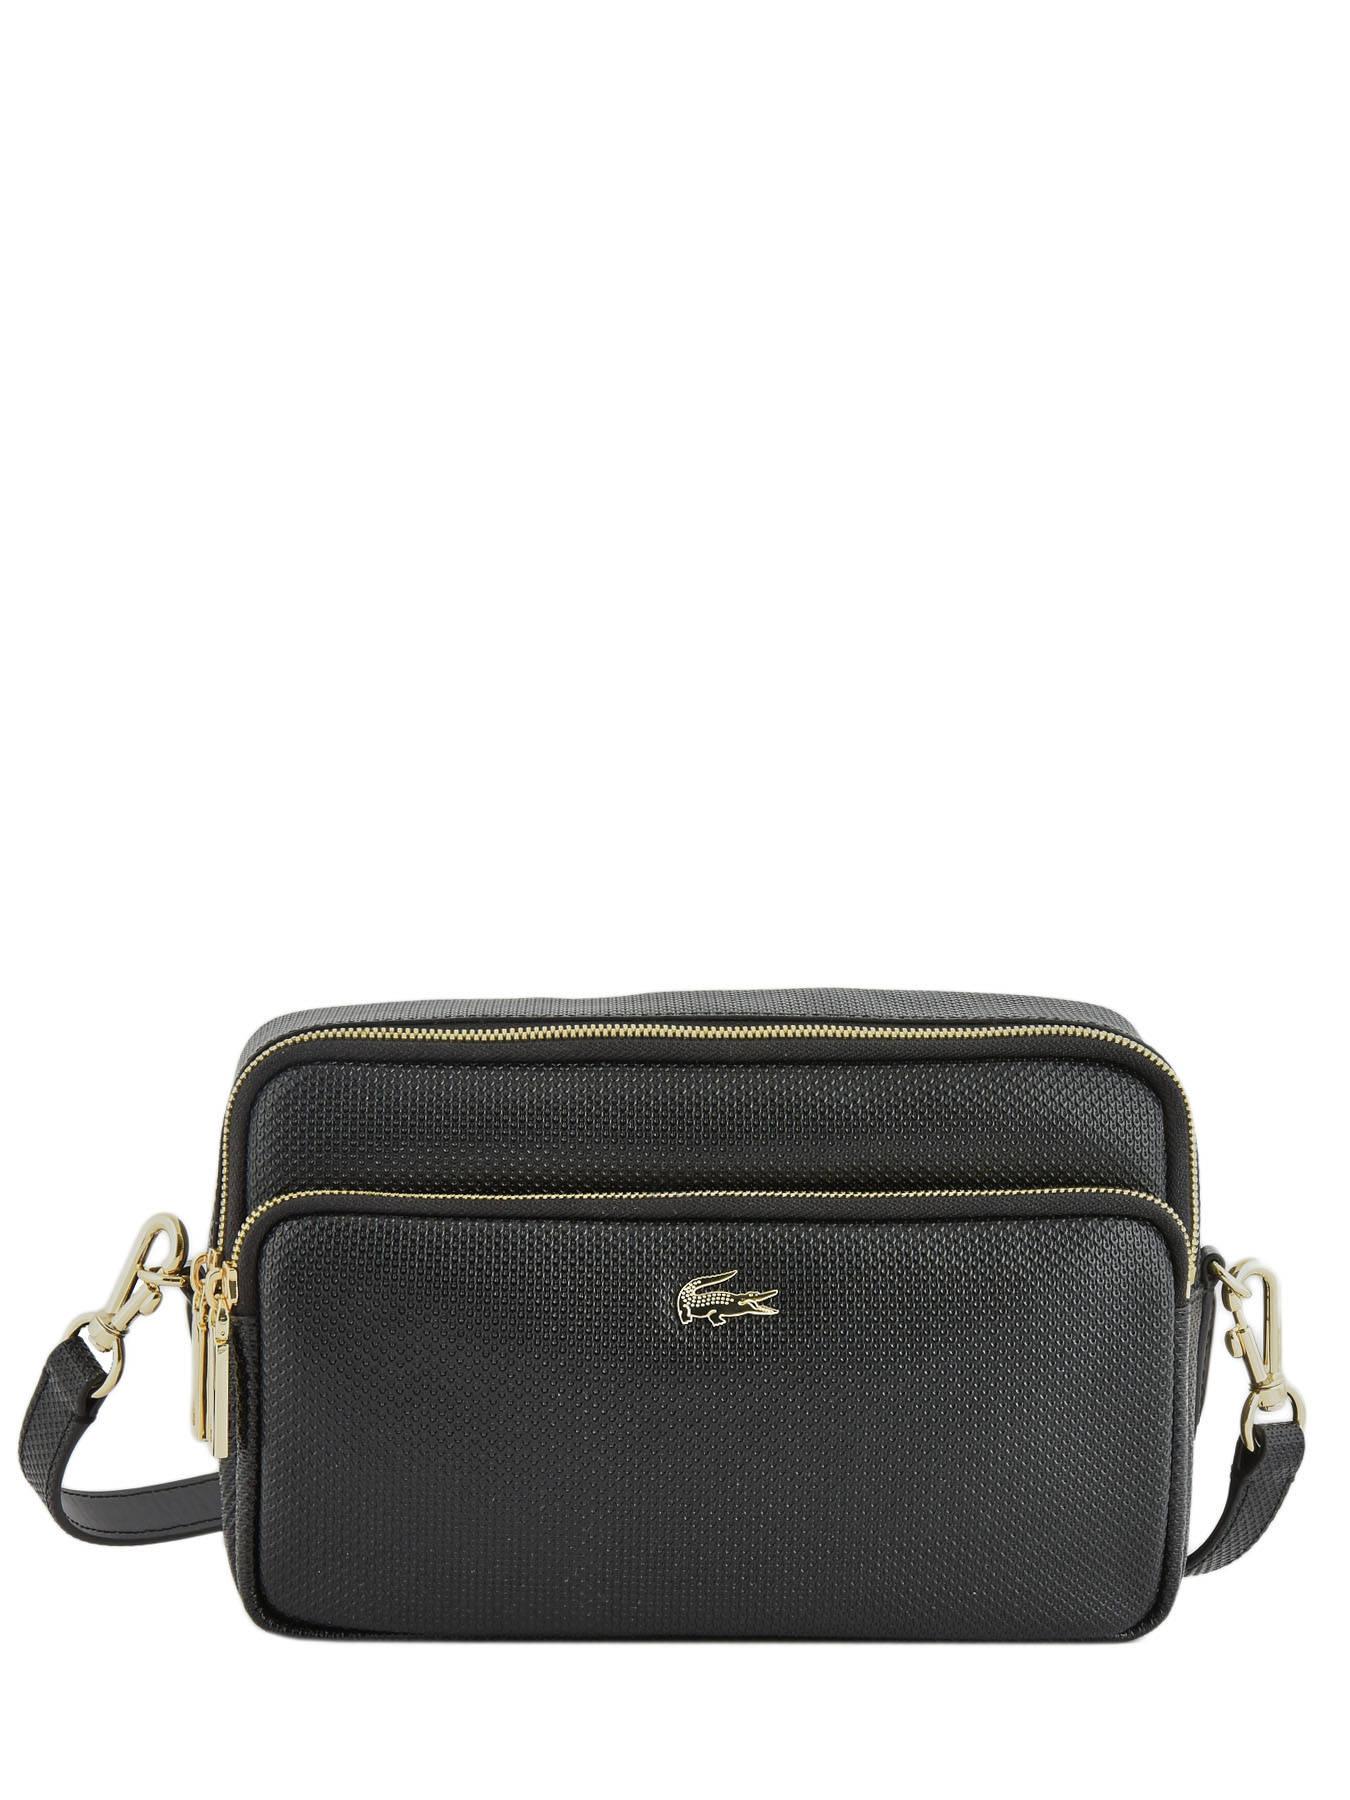 Leather Lacoste Crossbody Crossbody Bag Chantaco 7gyYbf6Iv